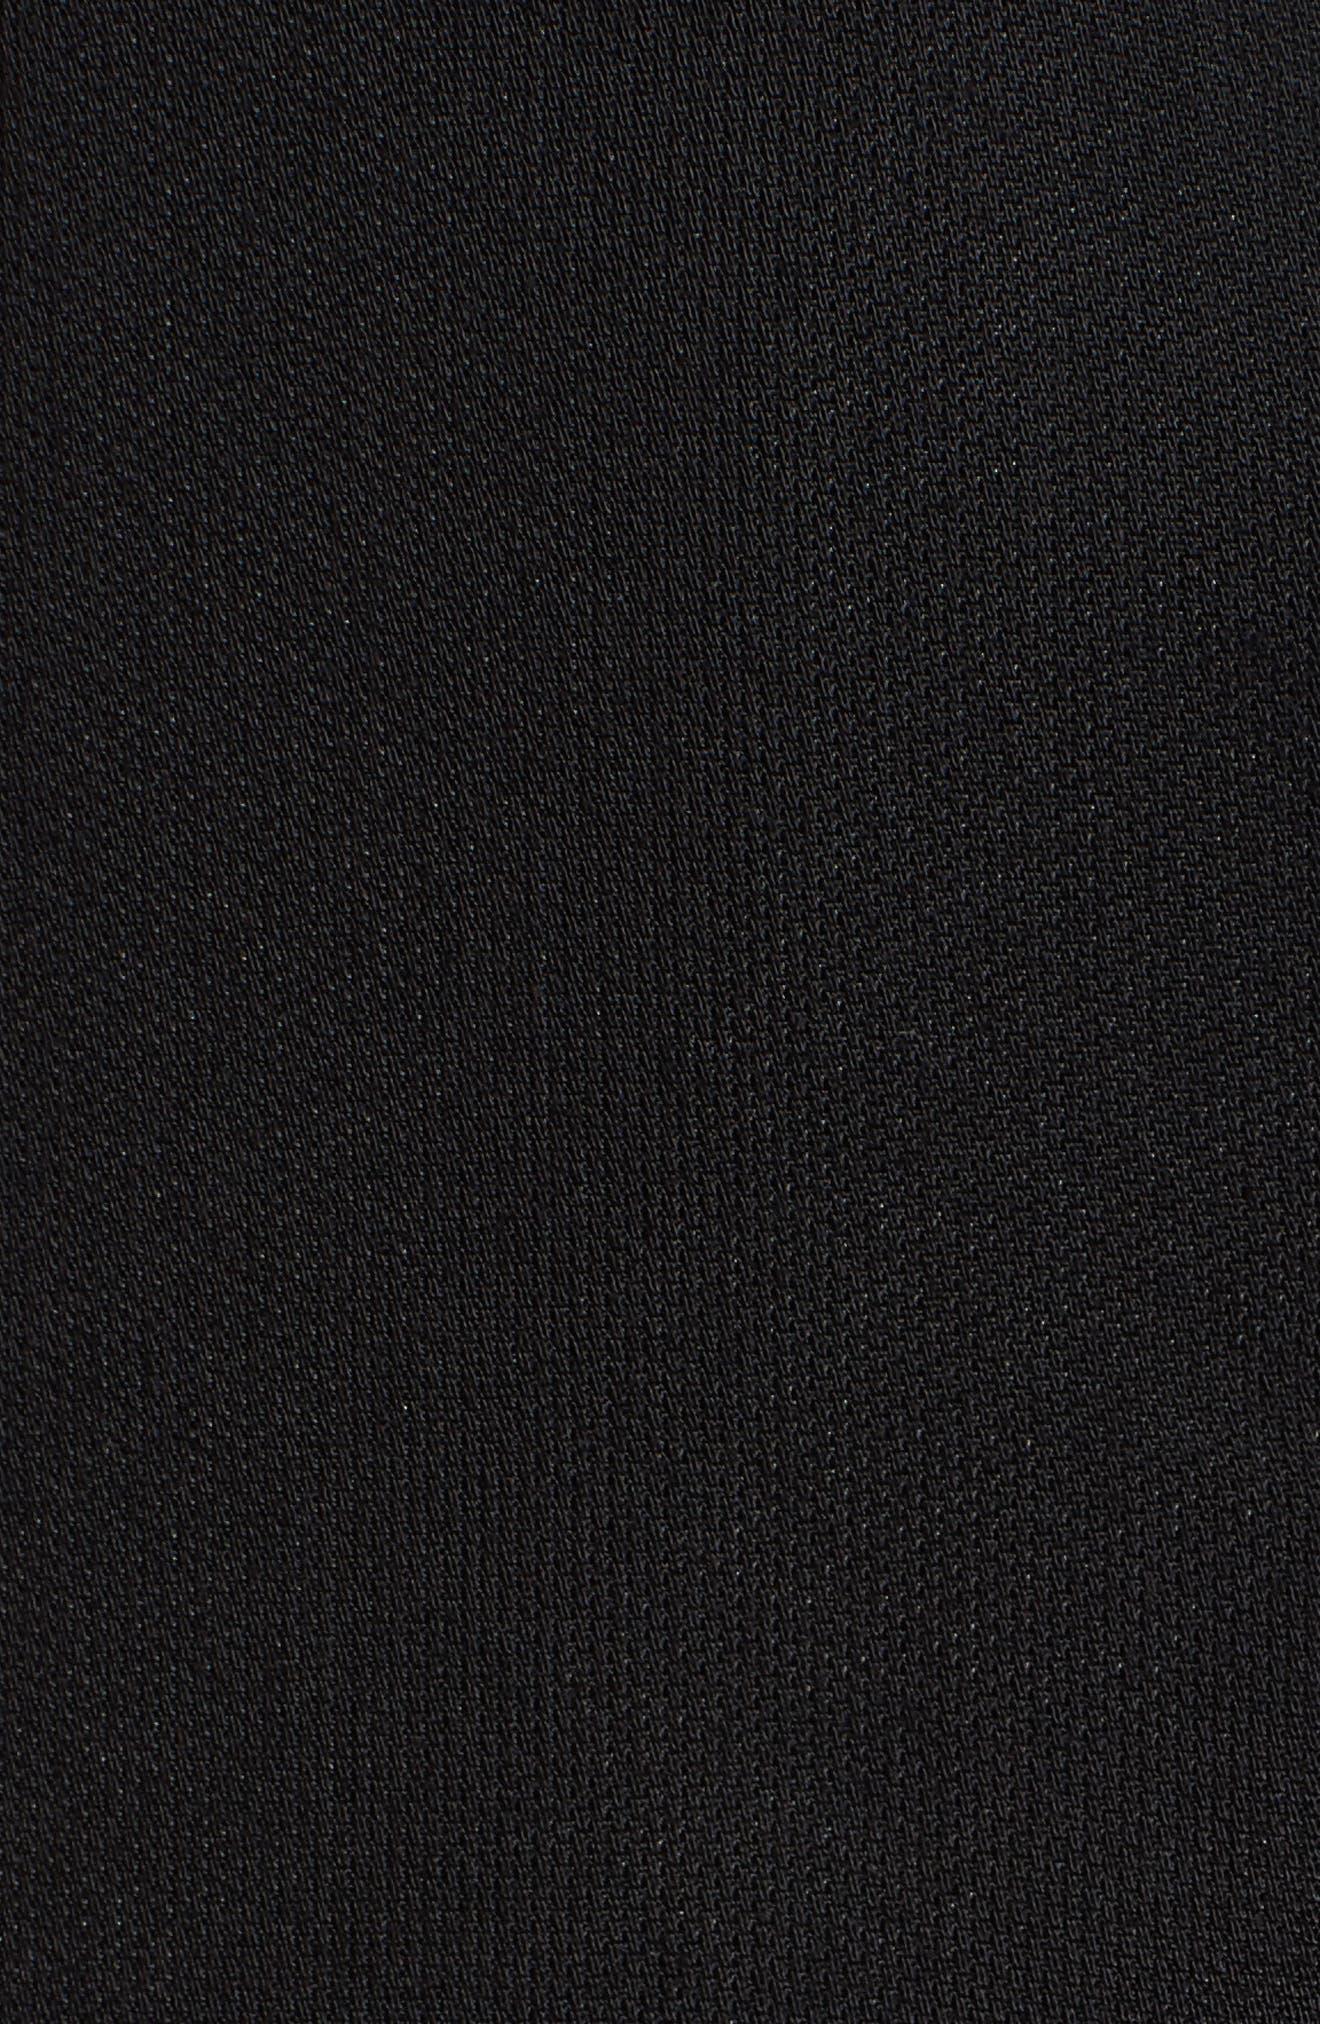 Jett Shirtdress,                             Alternate thumbnail 5, color,                             001